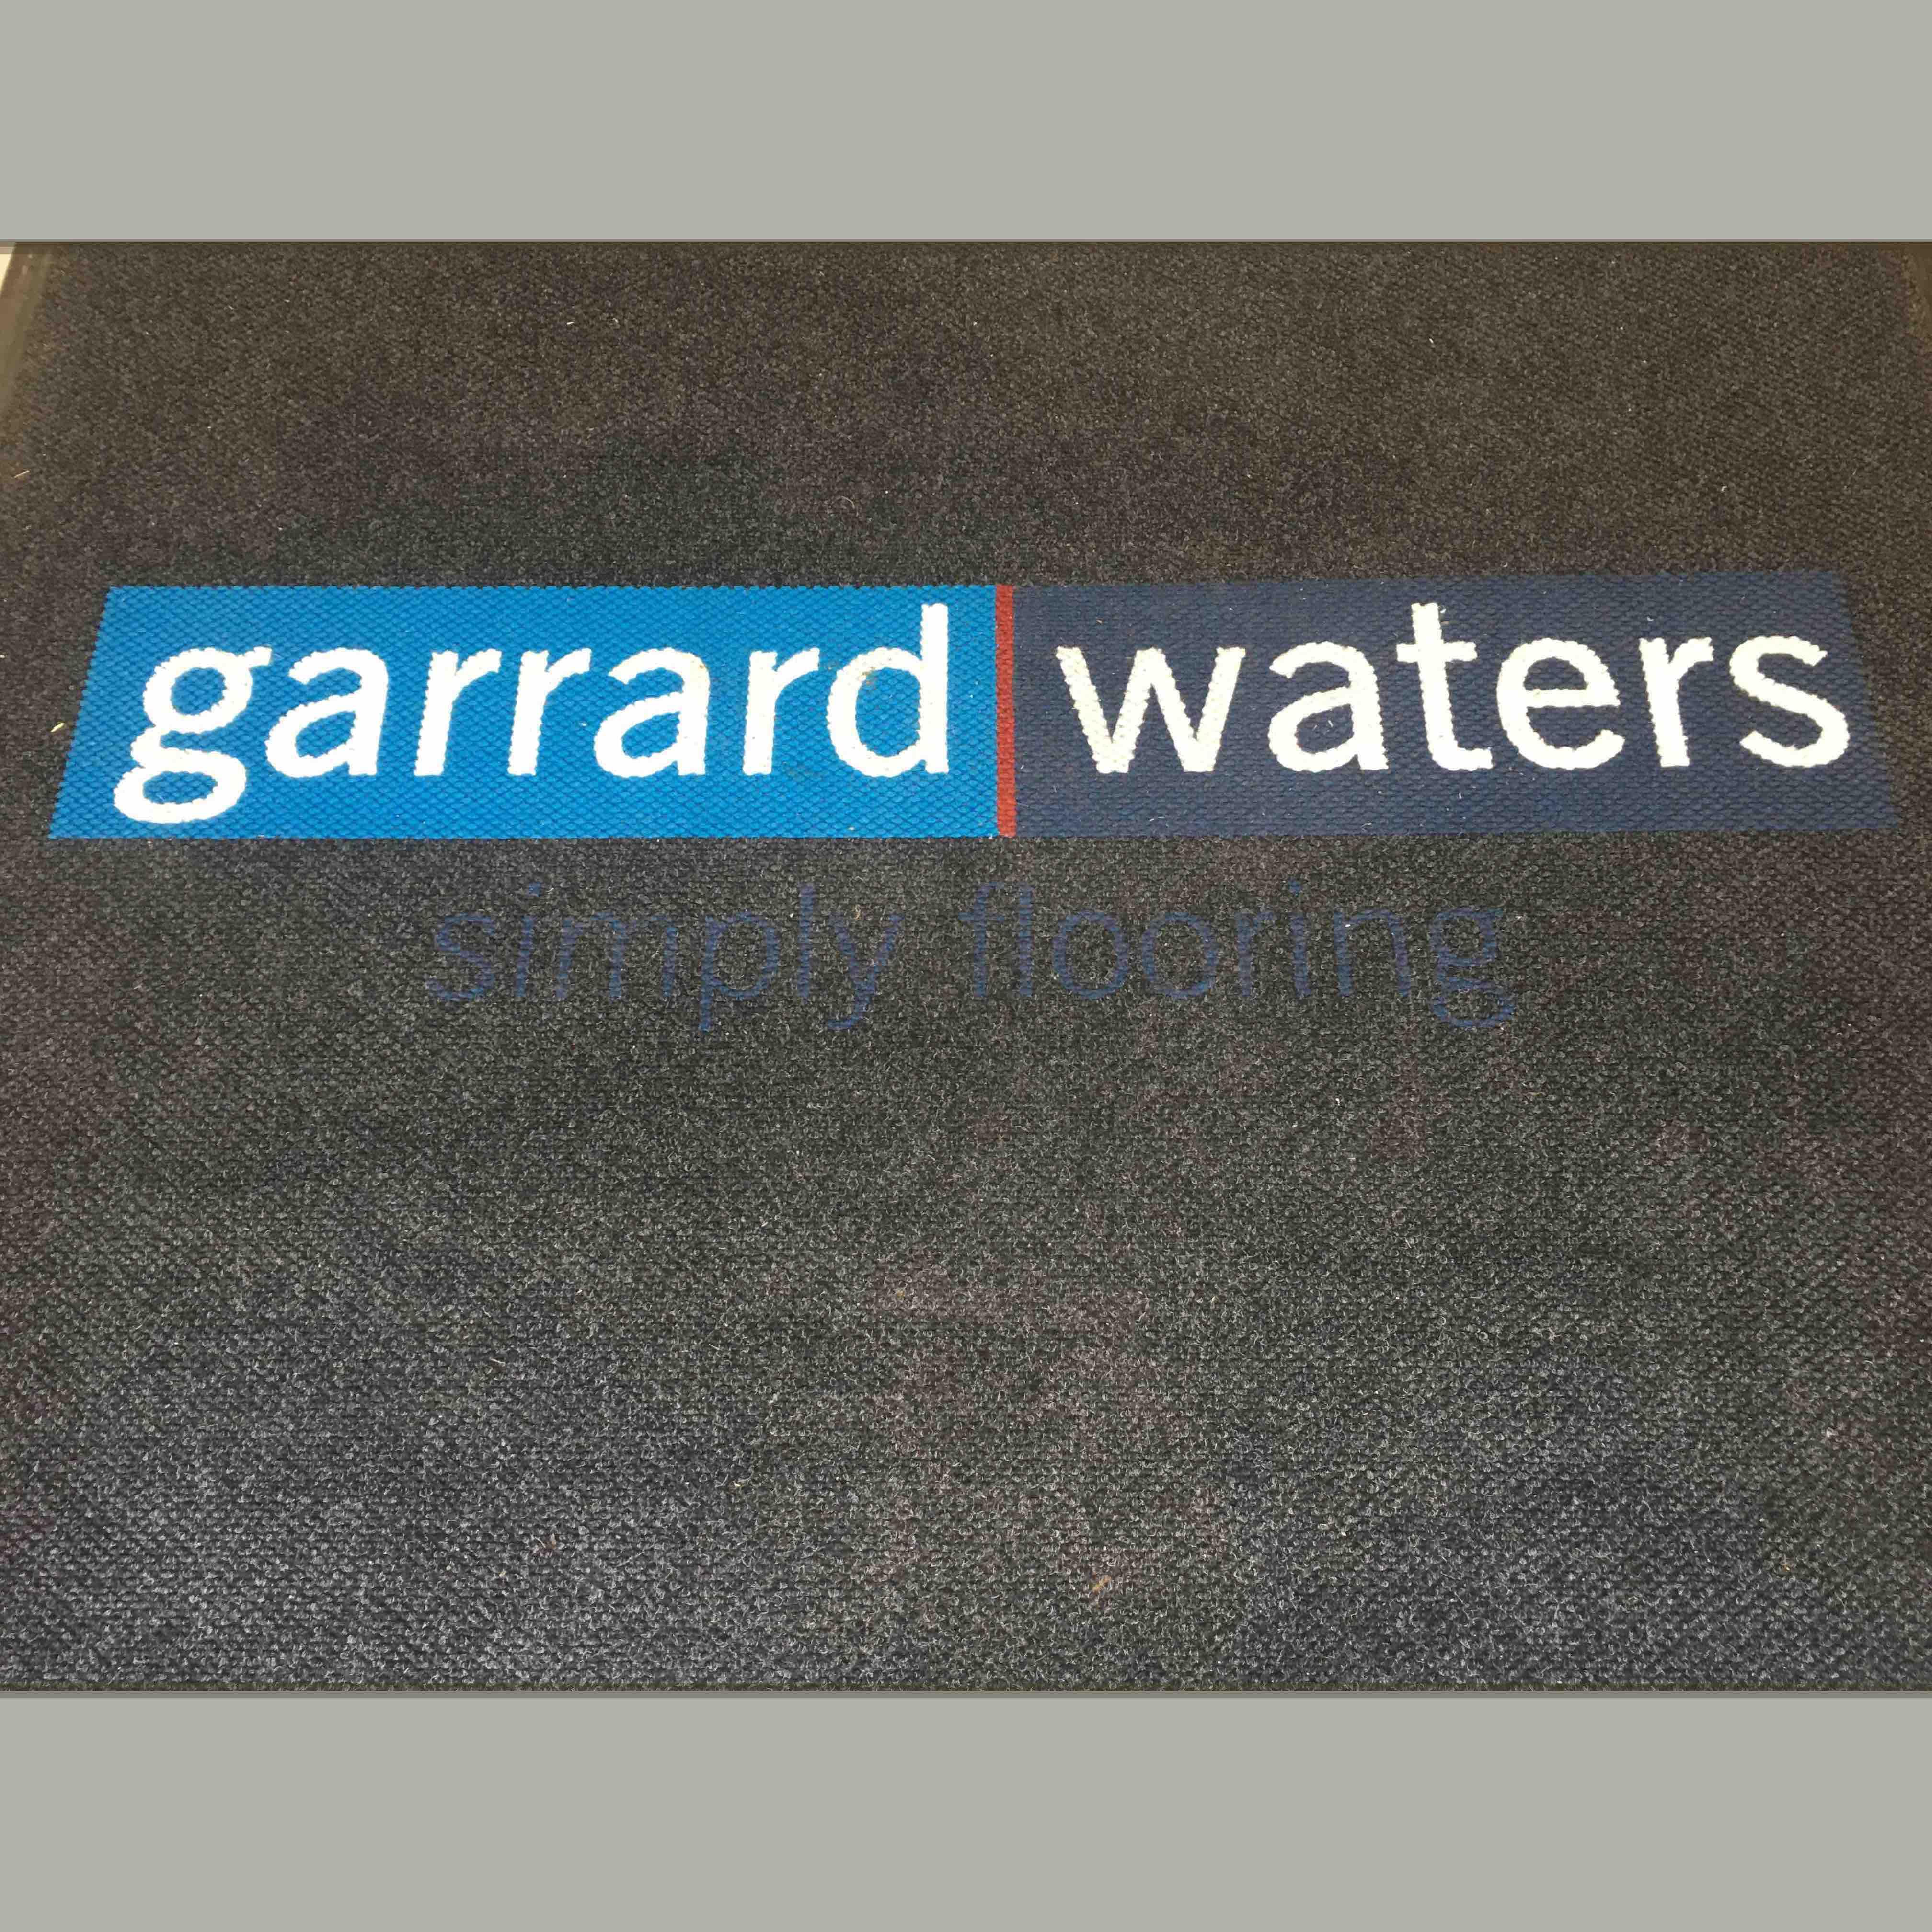 Garrard Waters